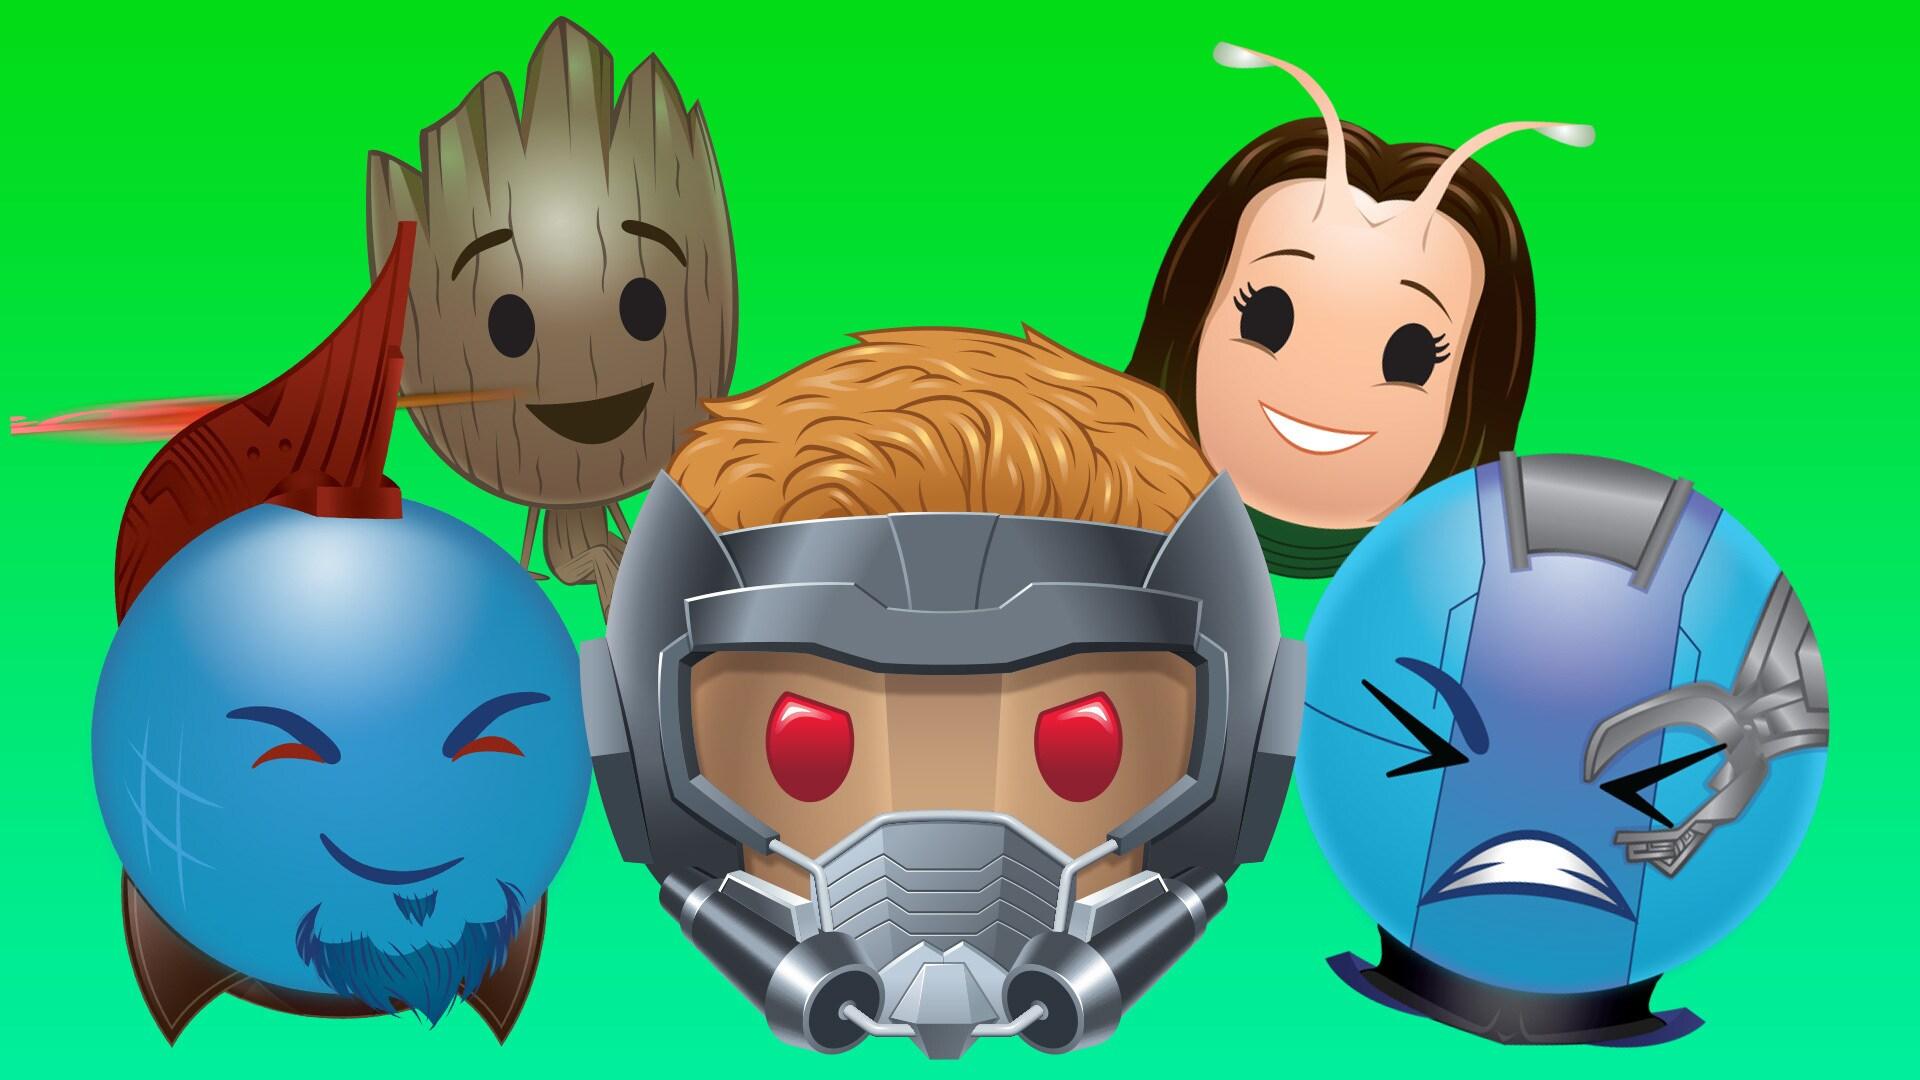 Guardians of the Galaxy Vol. 2 | Disney As Told By Emoji